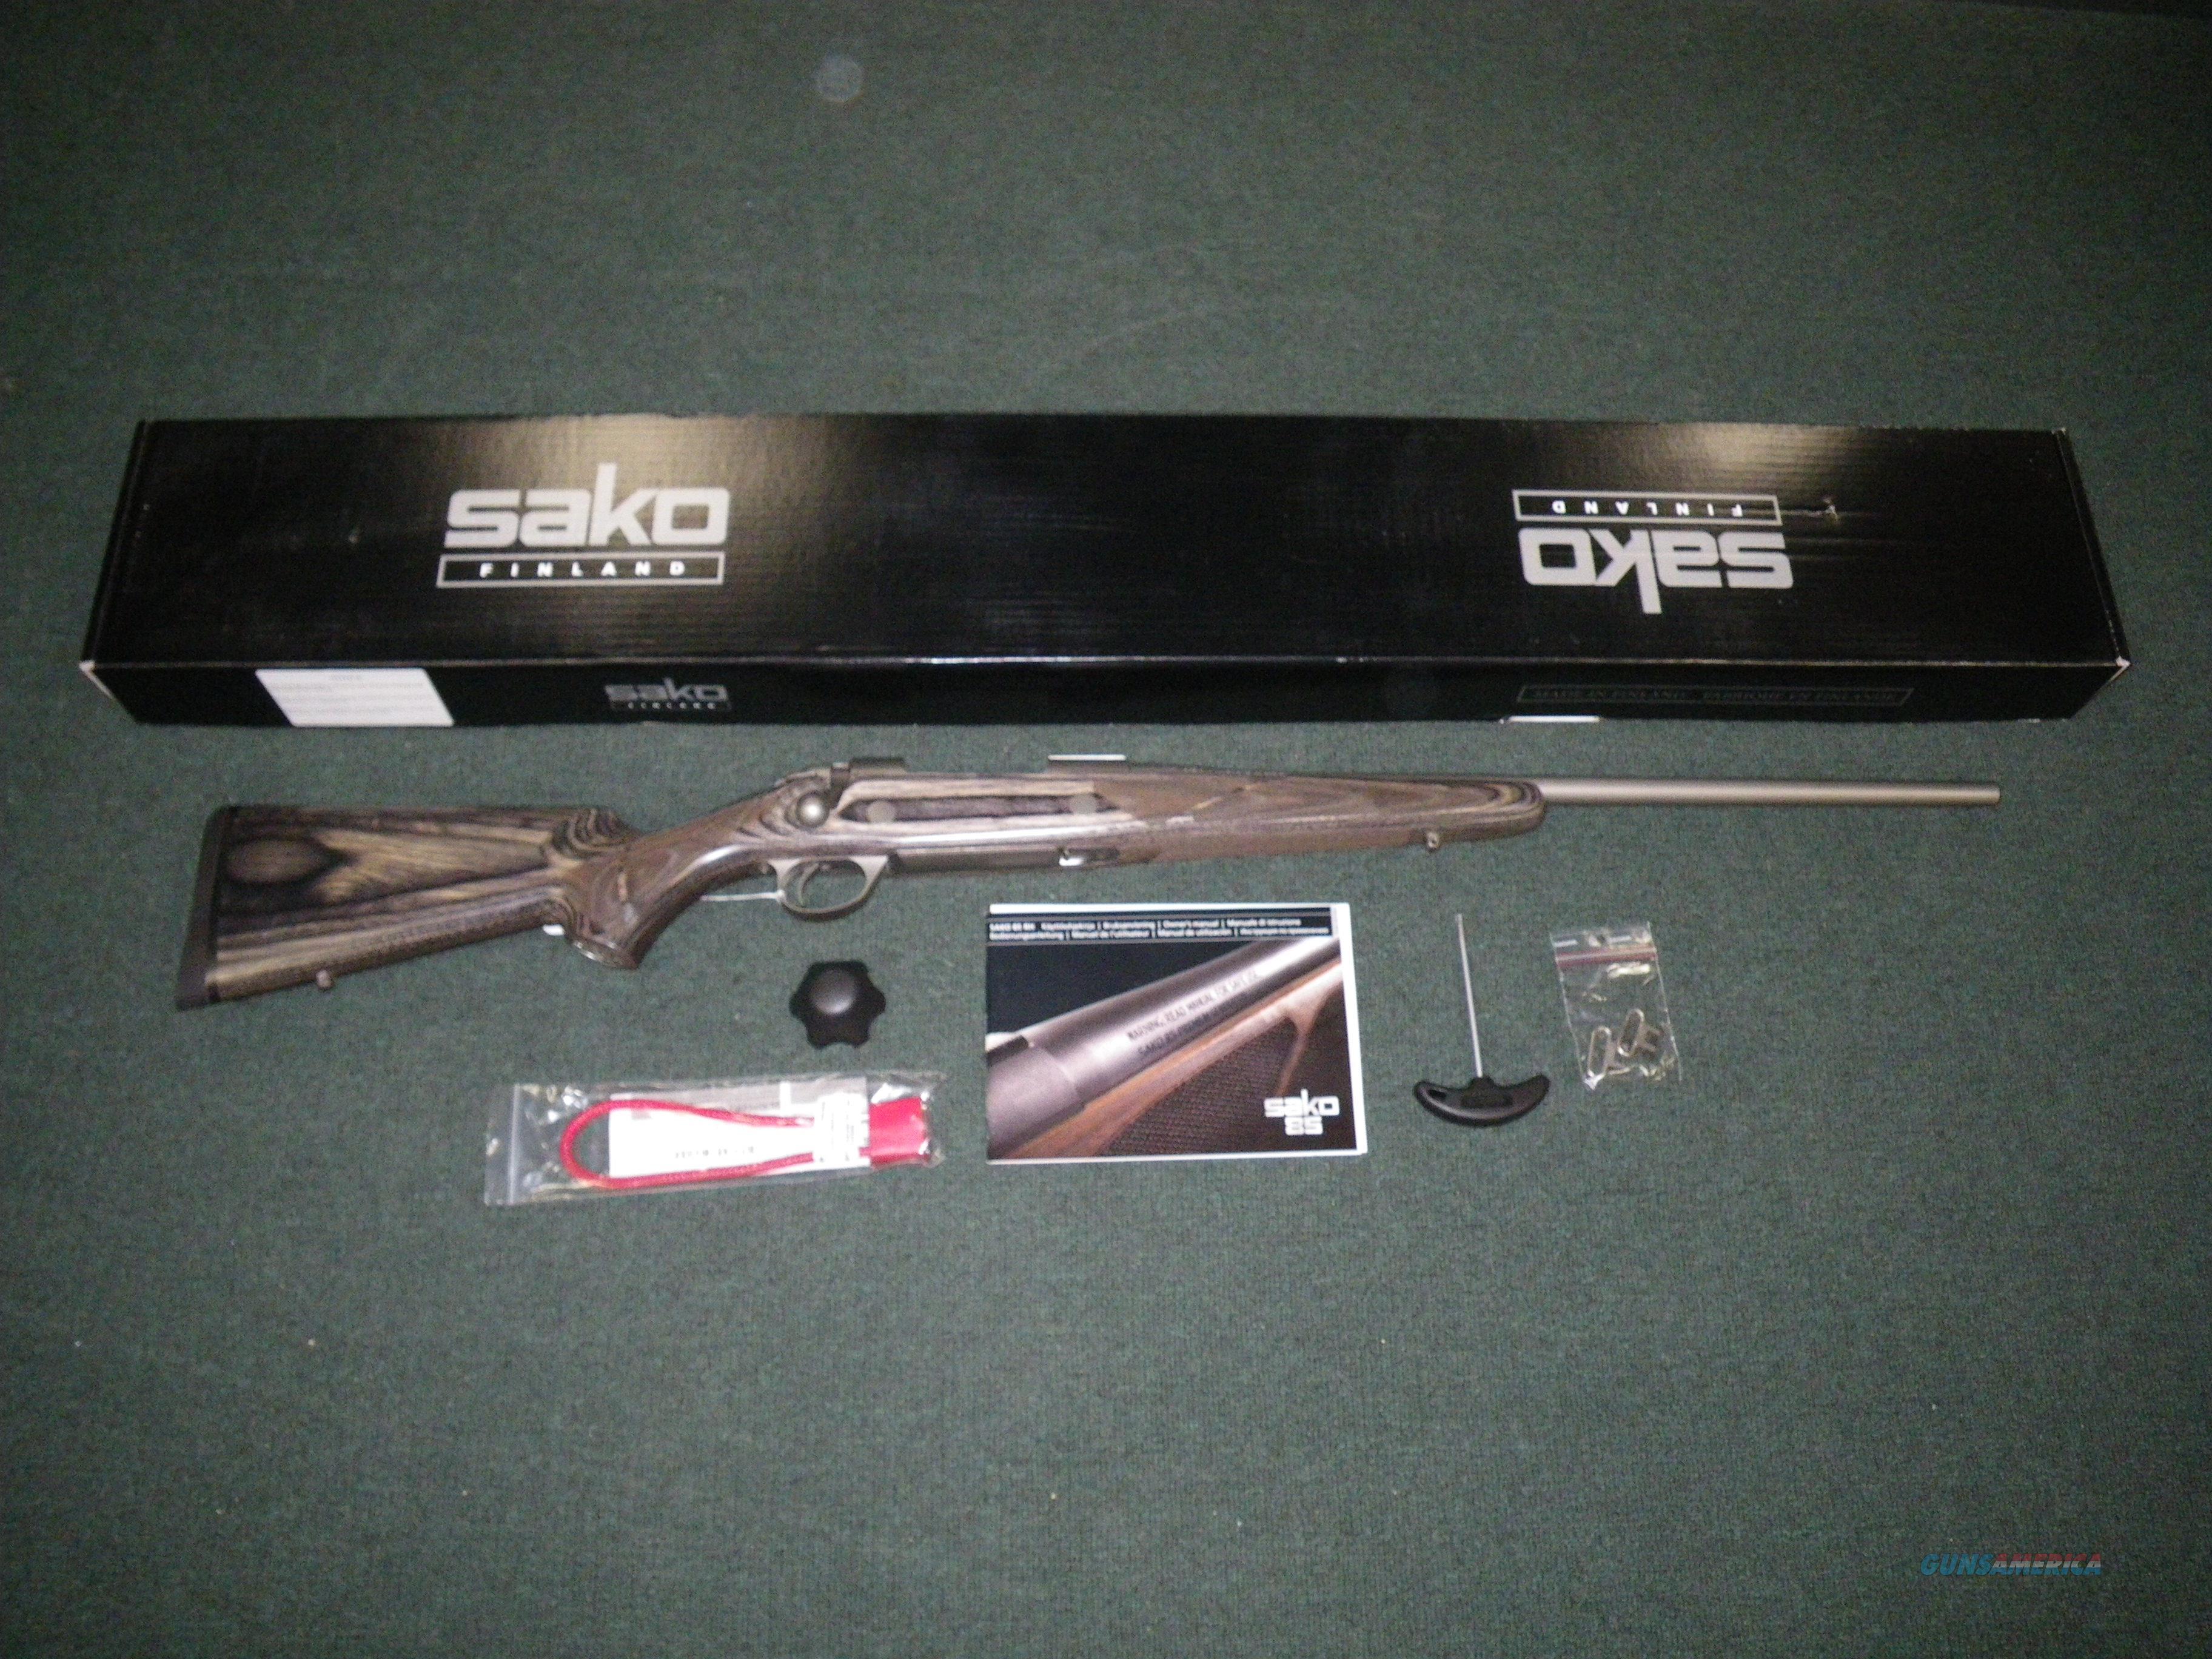 "Sako 85 Greywolf 300 Win Mag 24"" Stainless NEW #JRS2C31  Guns > Rifles > Sako Rifles > M85 Series"